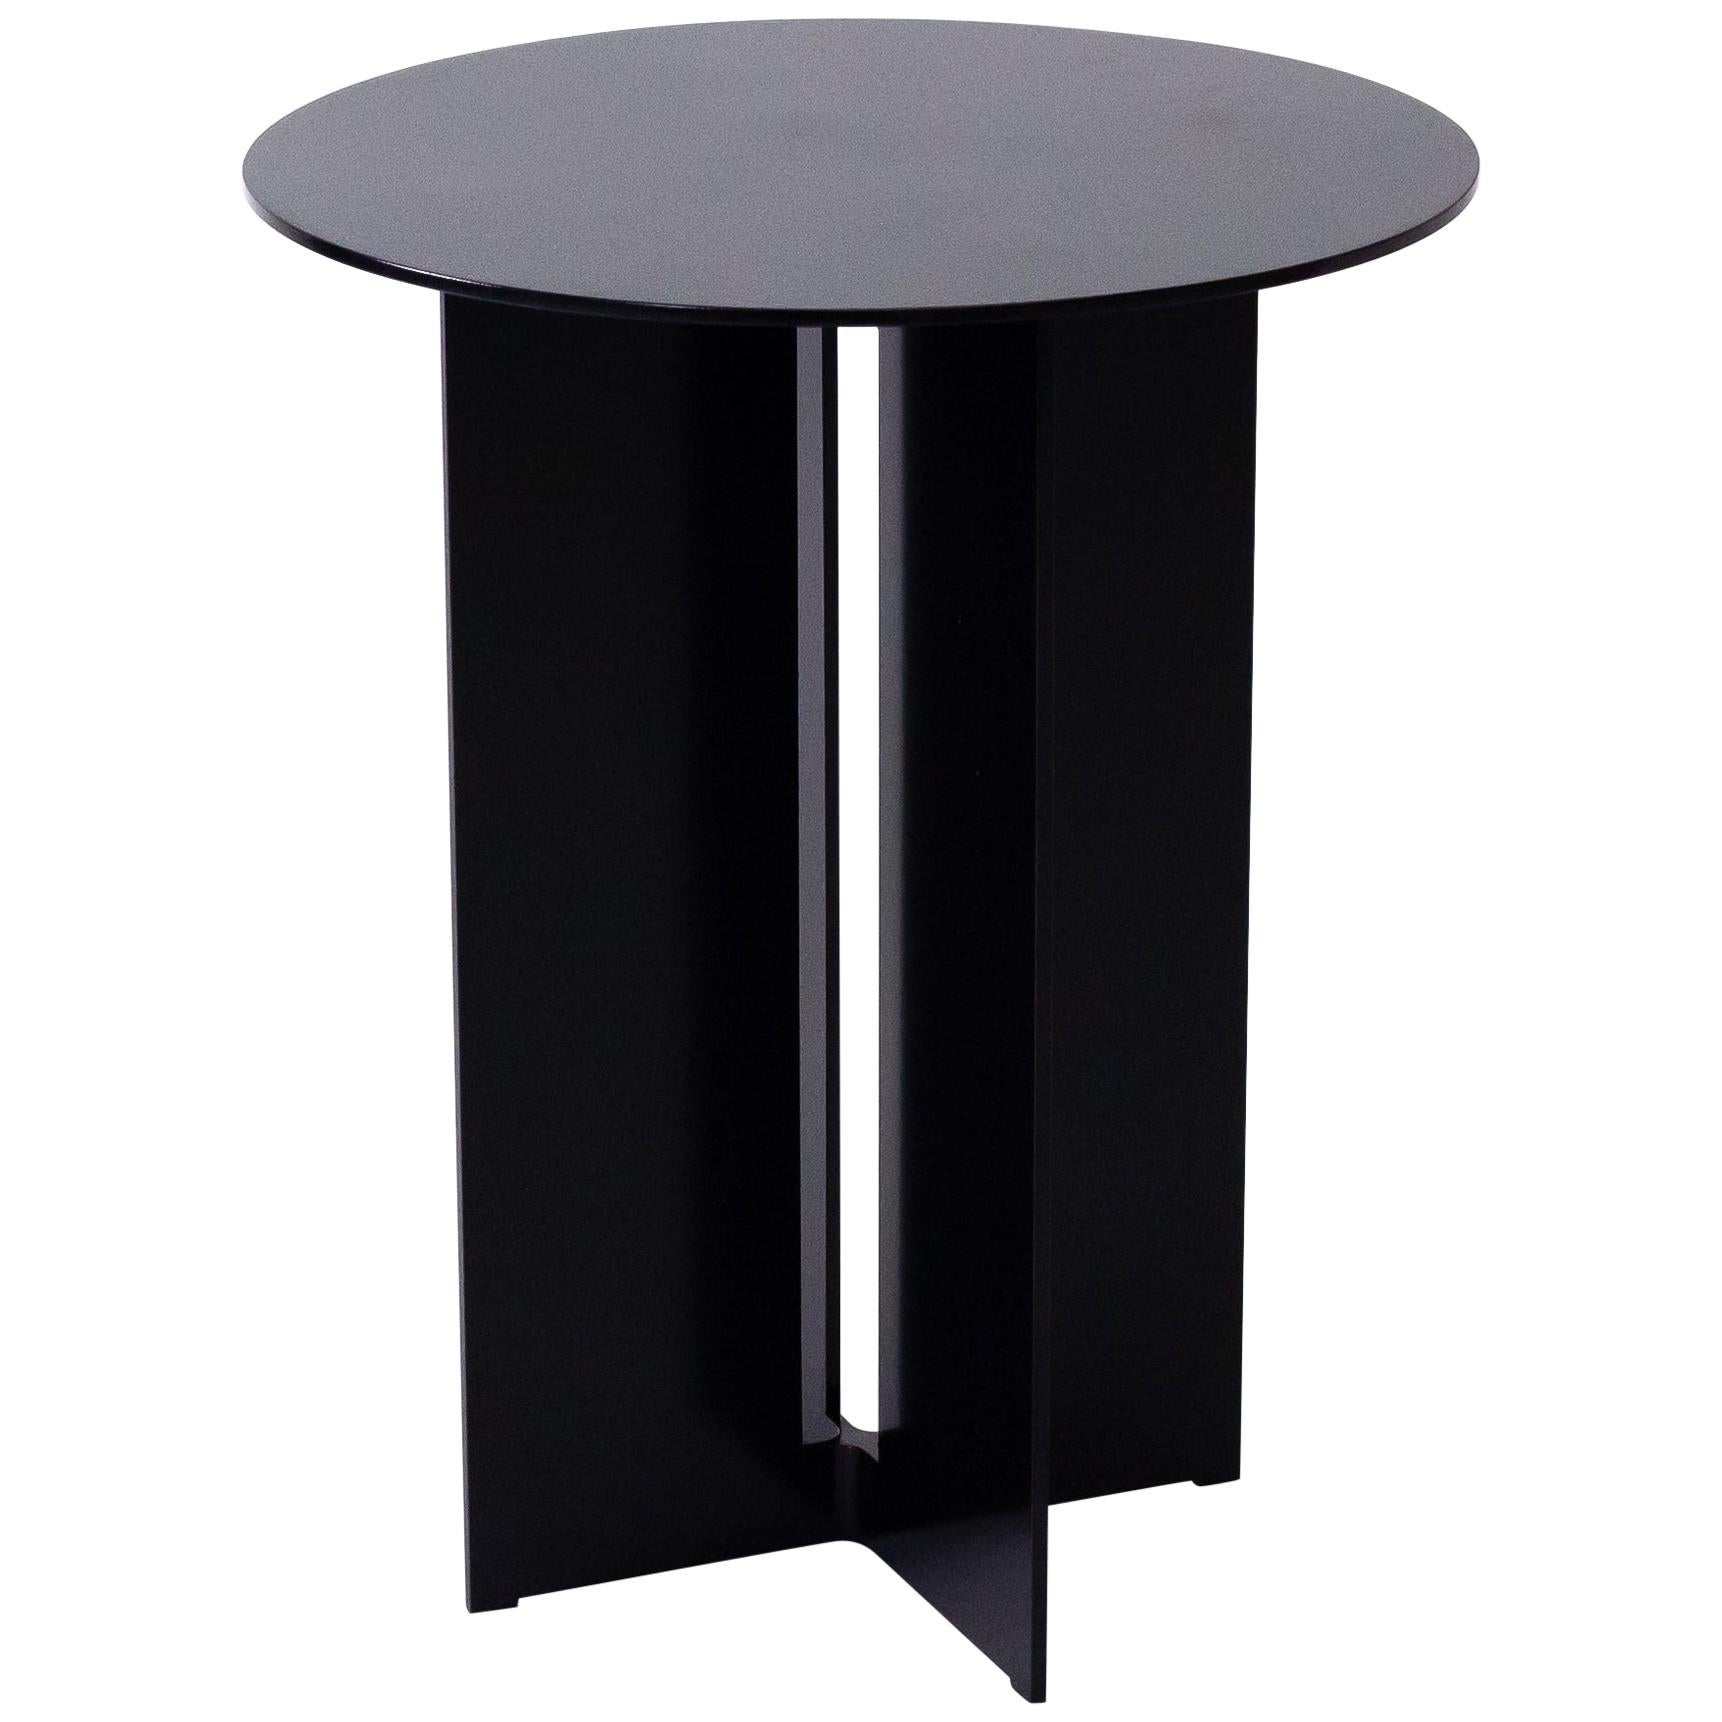 Mers Side Table in Powdercoat Aluminum Black